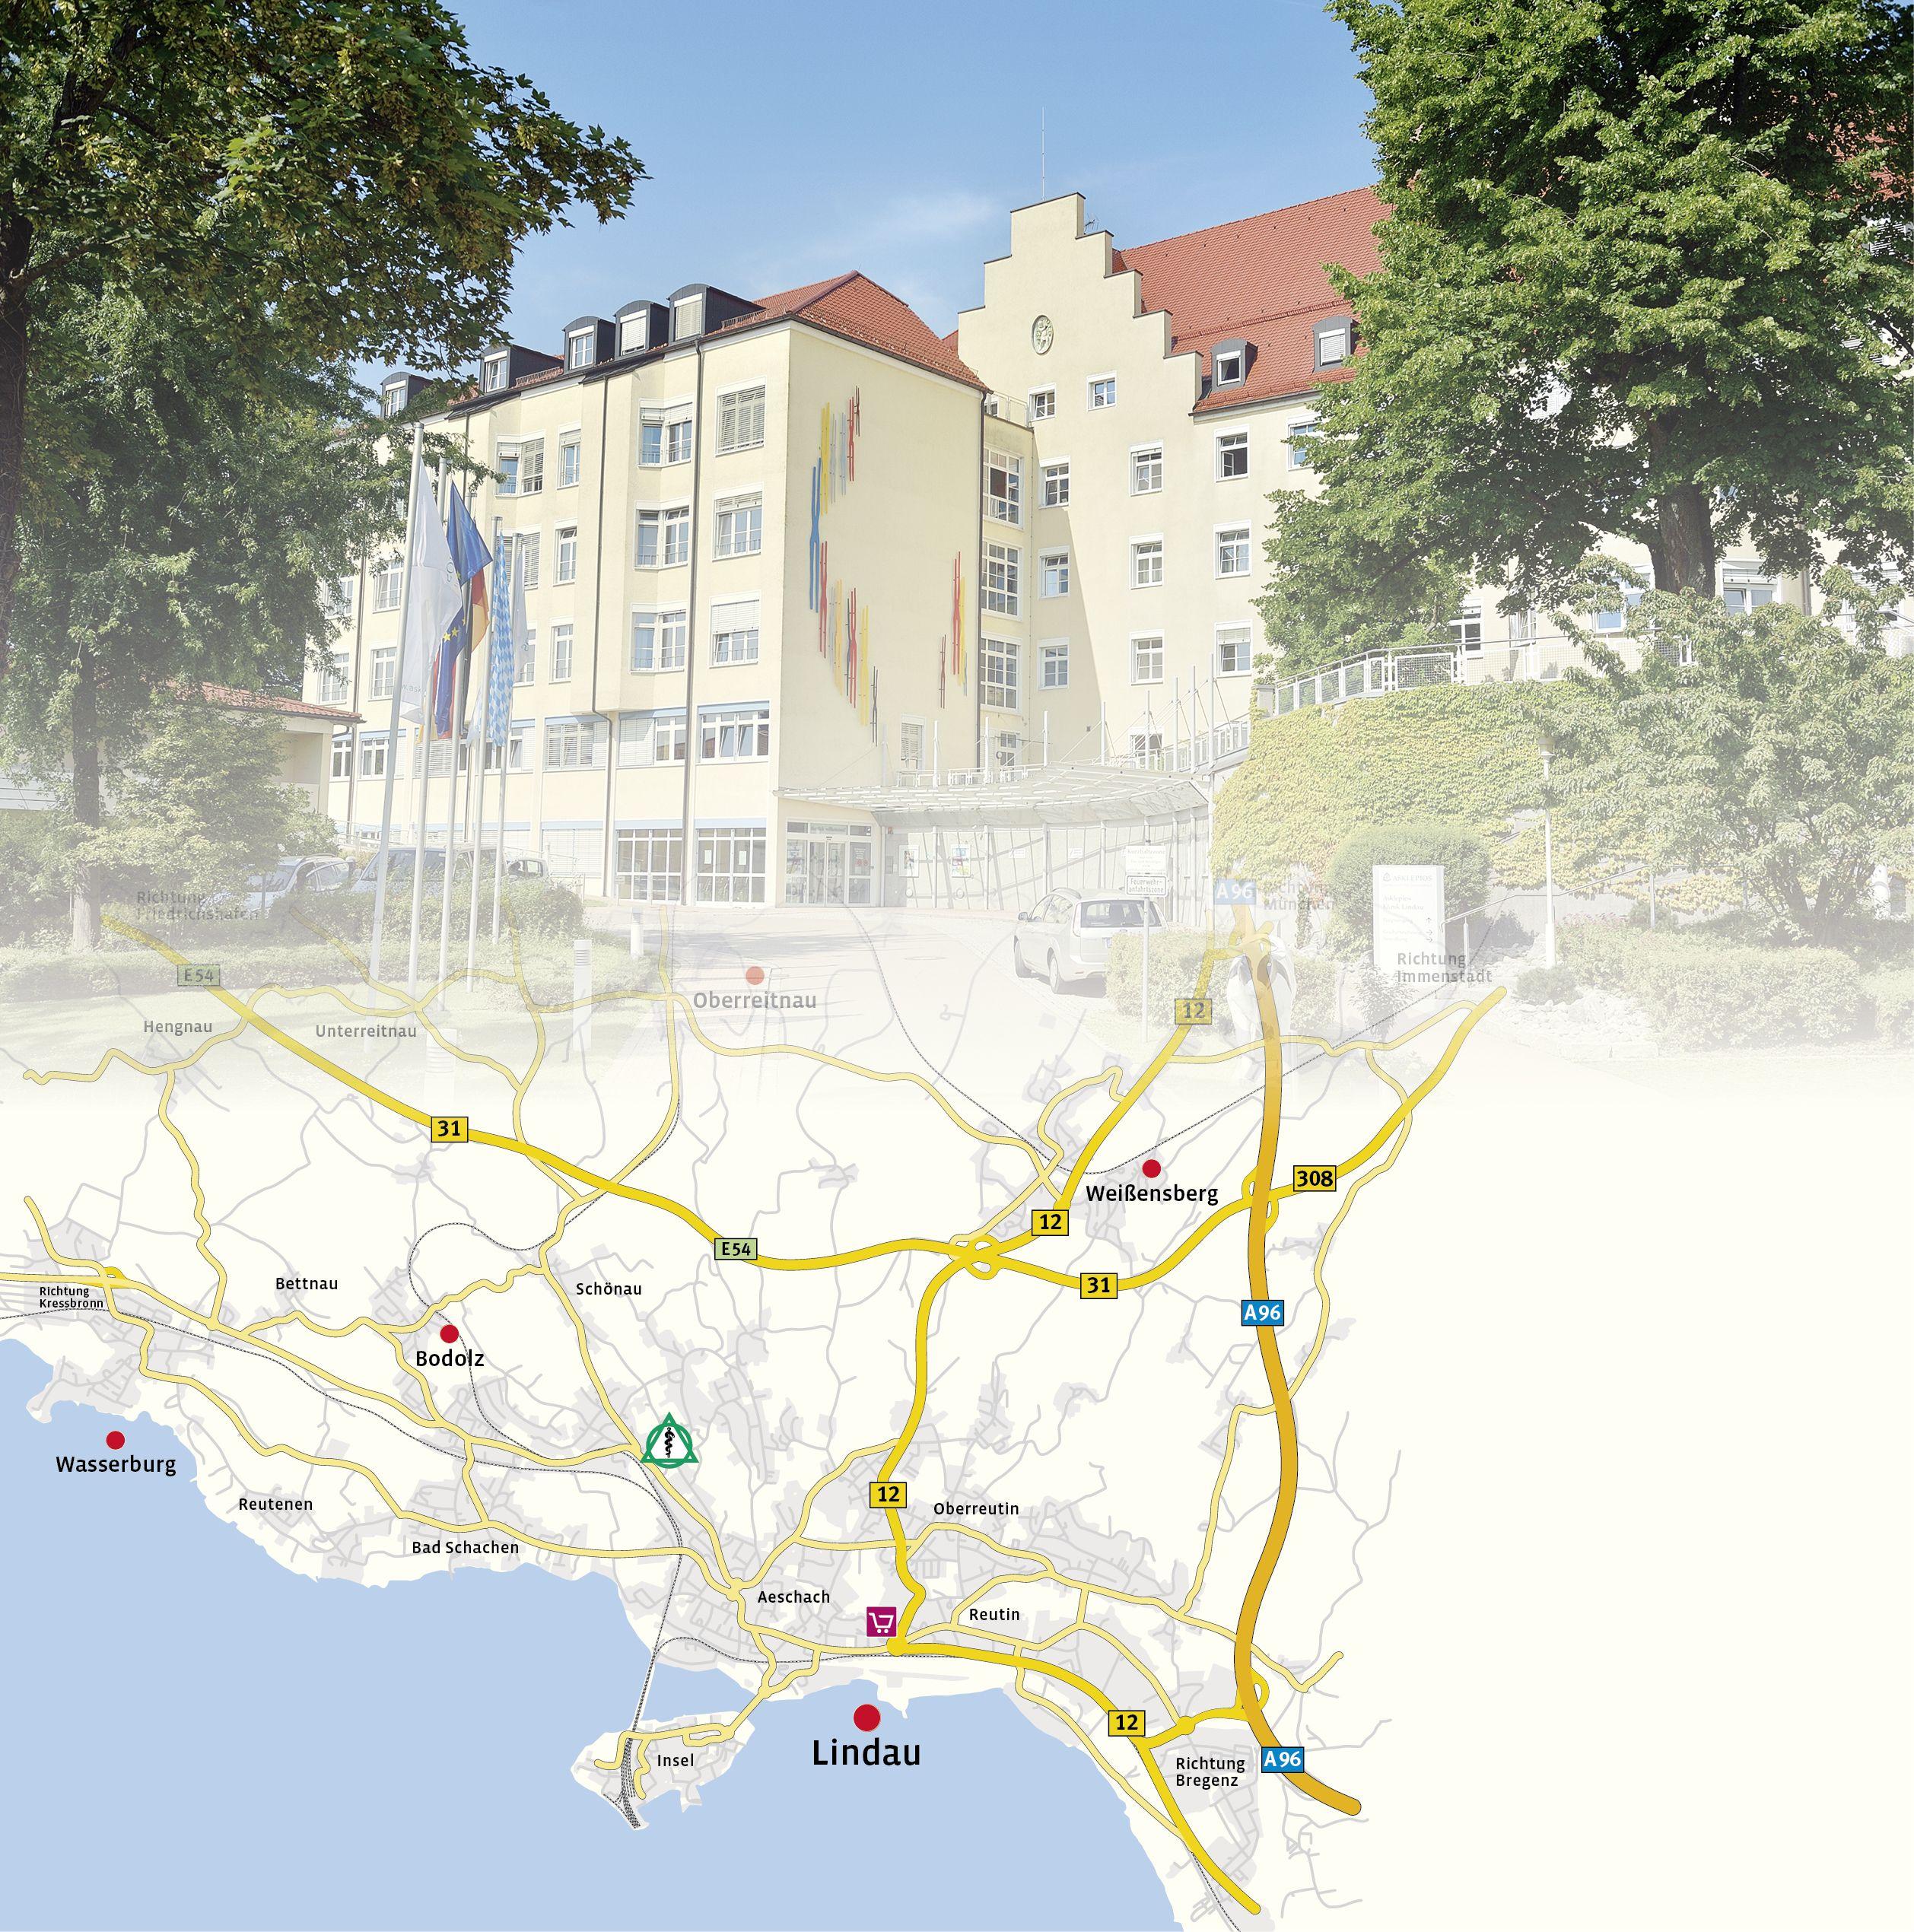 Anreise Zur Insel Wangerooge Mit Dem Auto Pkw: Asklepios Klinik Lindau